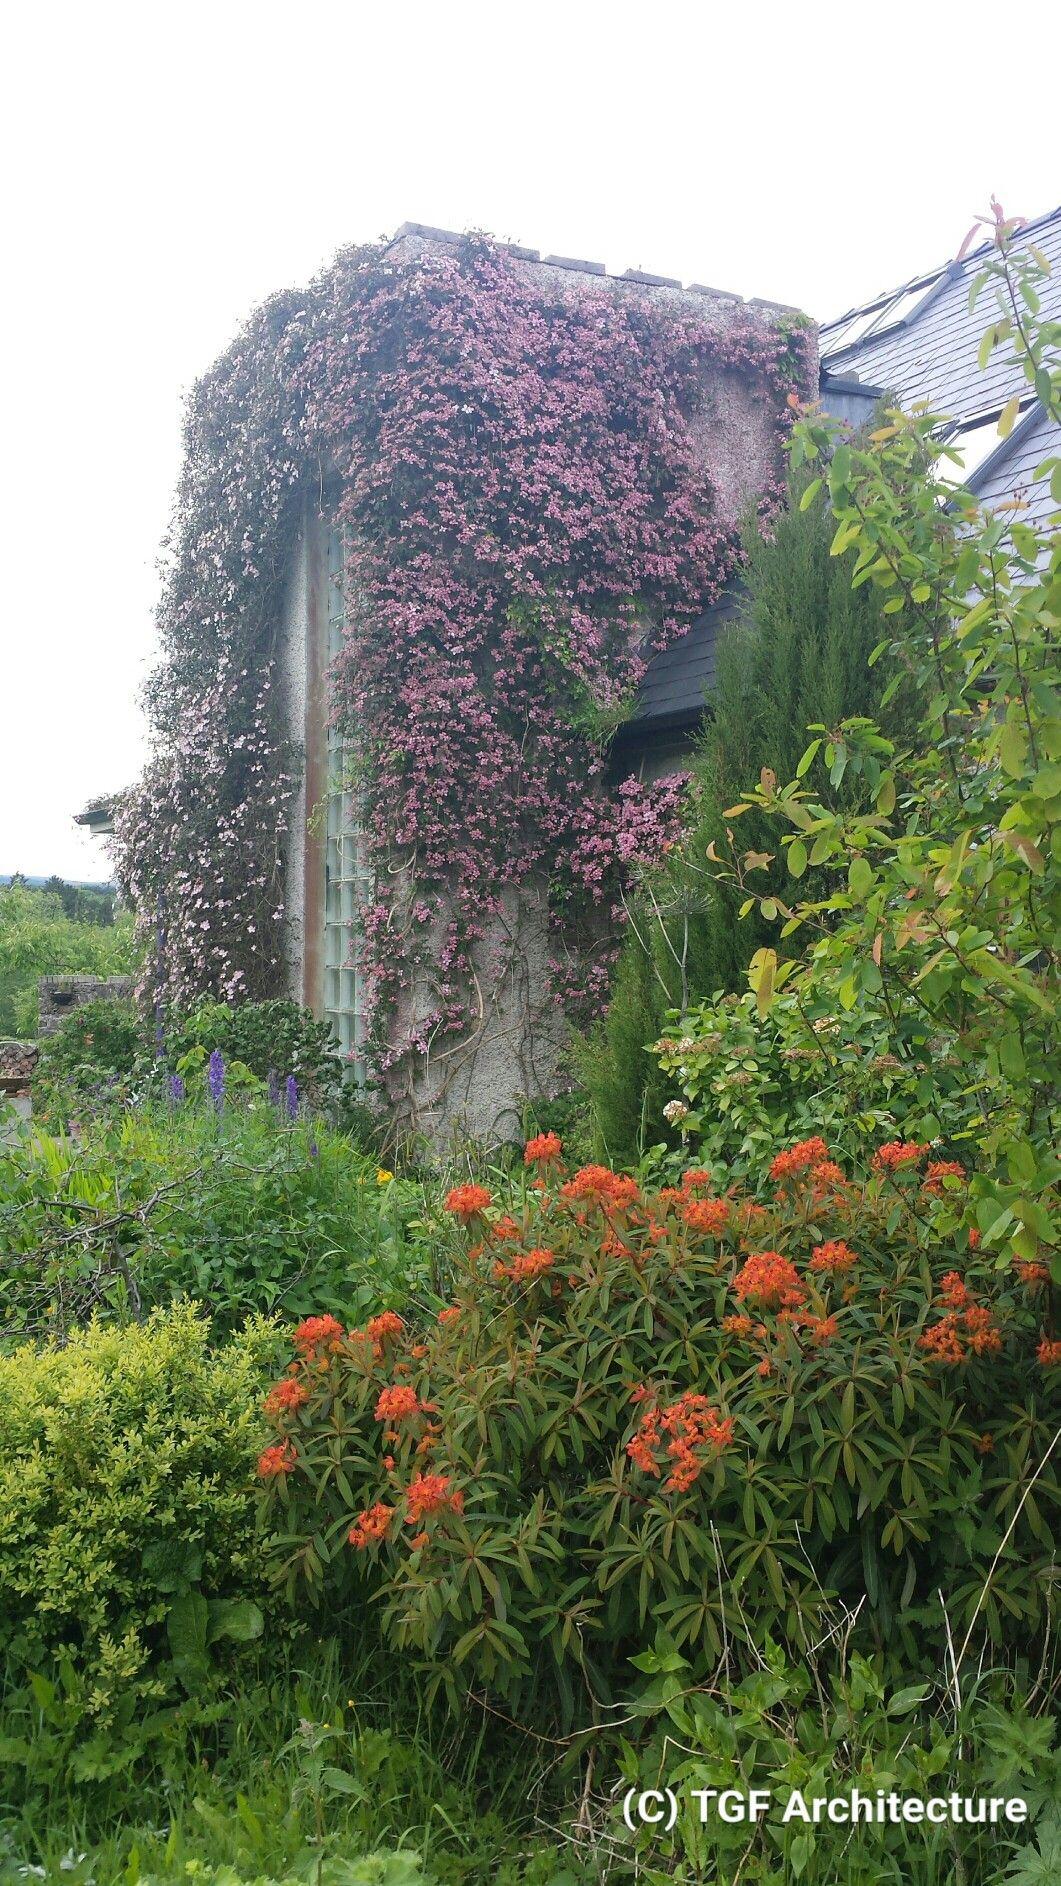 Wall planting at Sorrel Hill by Thomas G Flynn MRIAI TGF Architecture & Garden Design